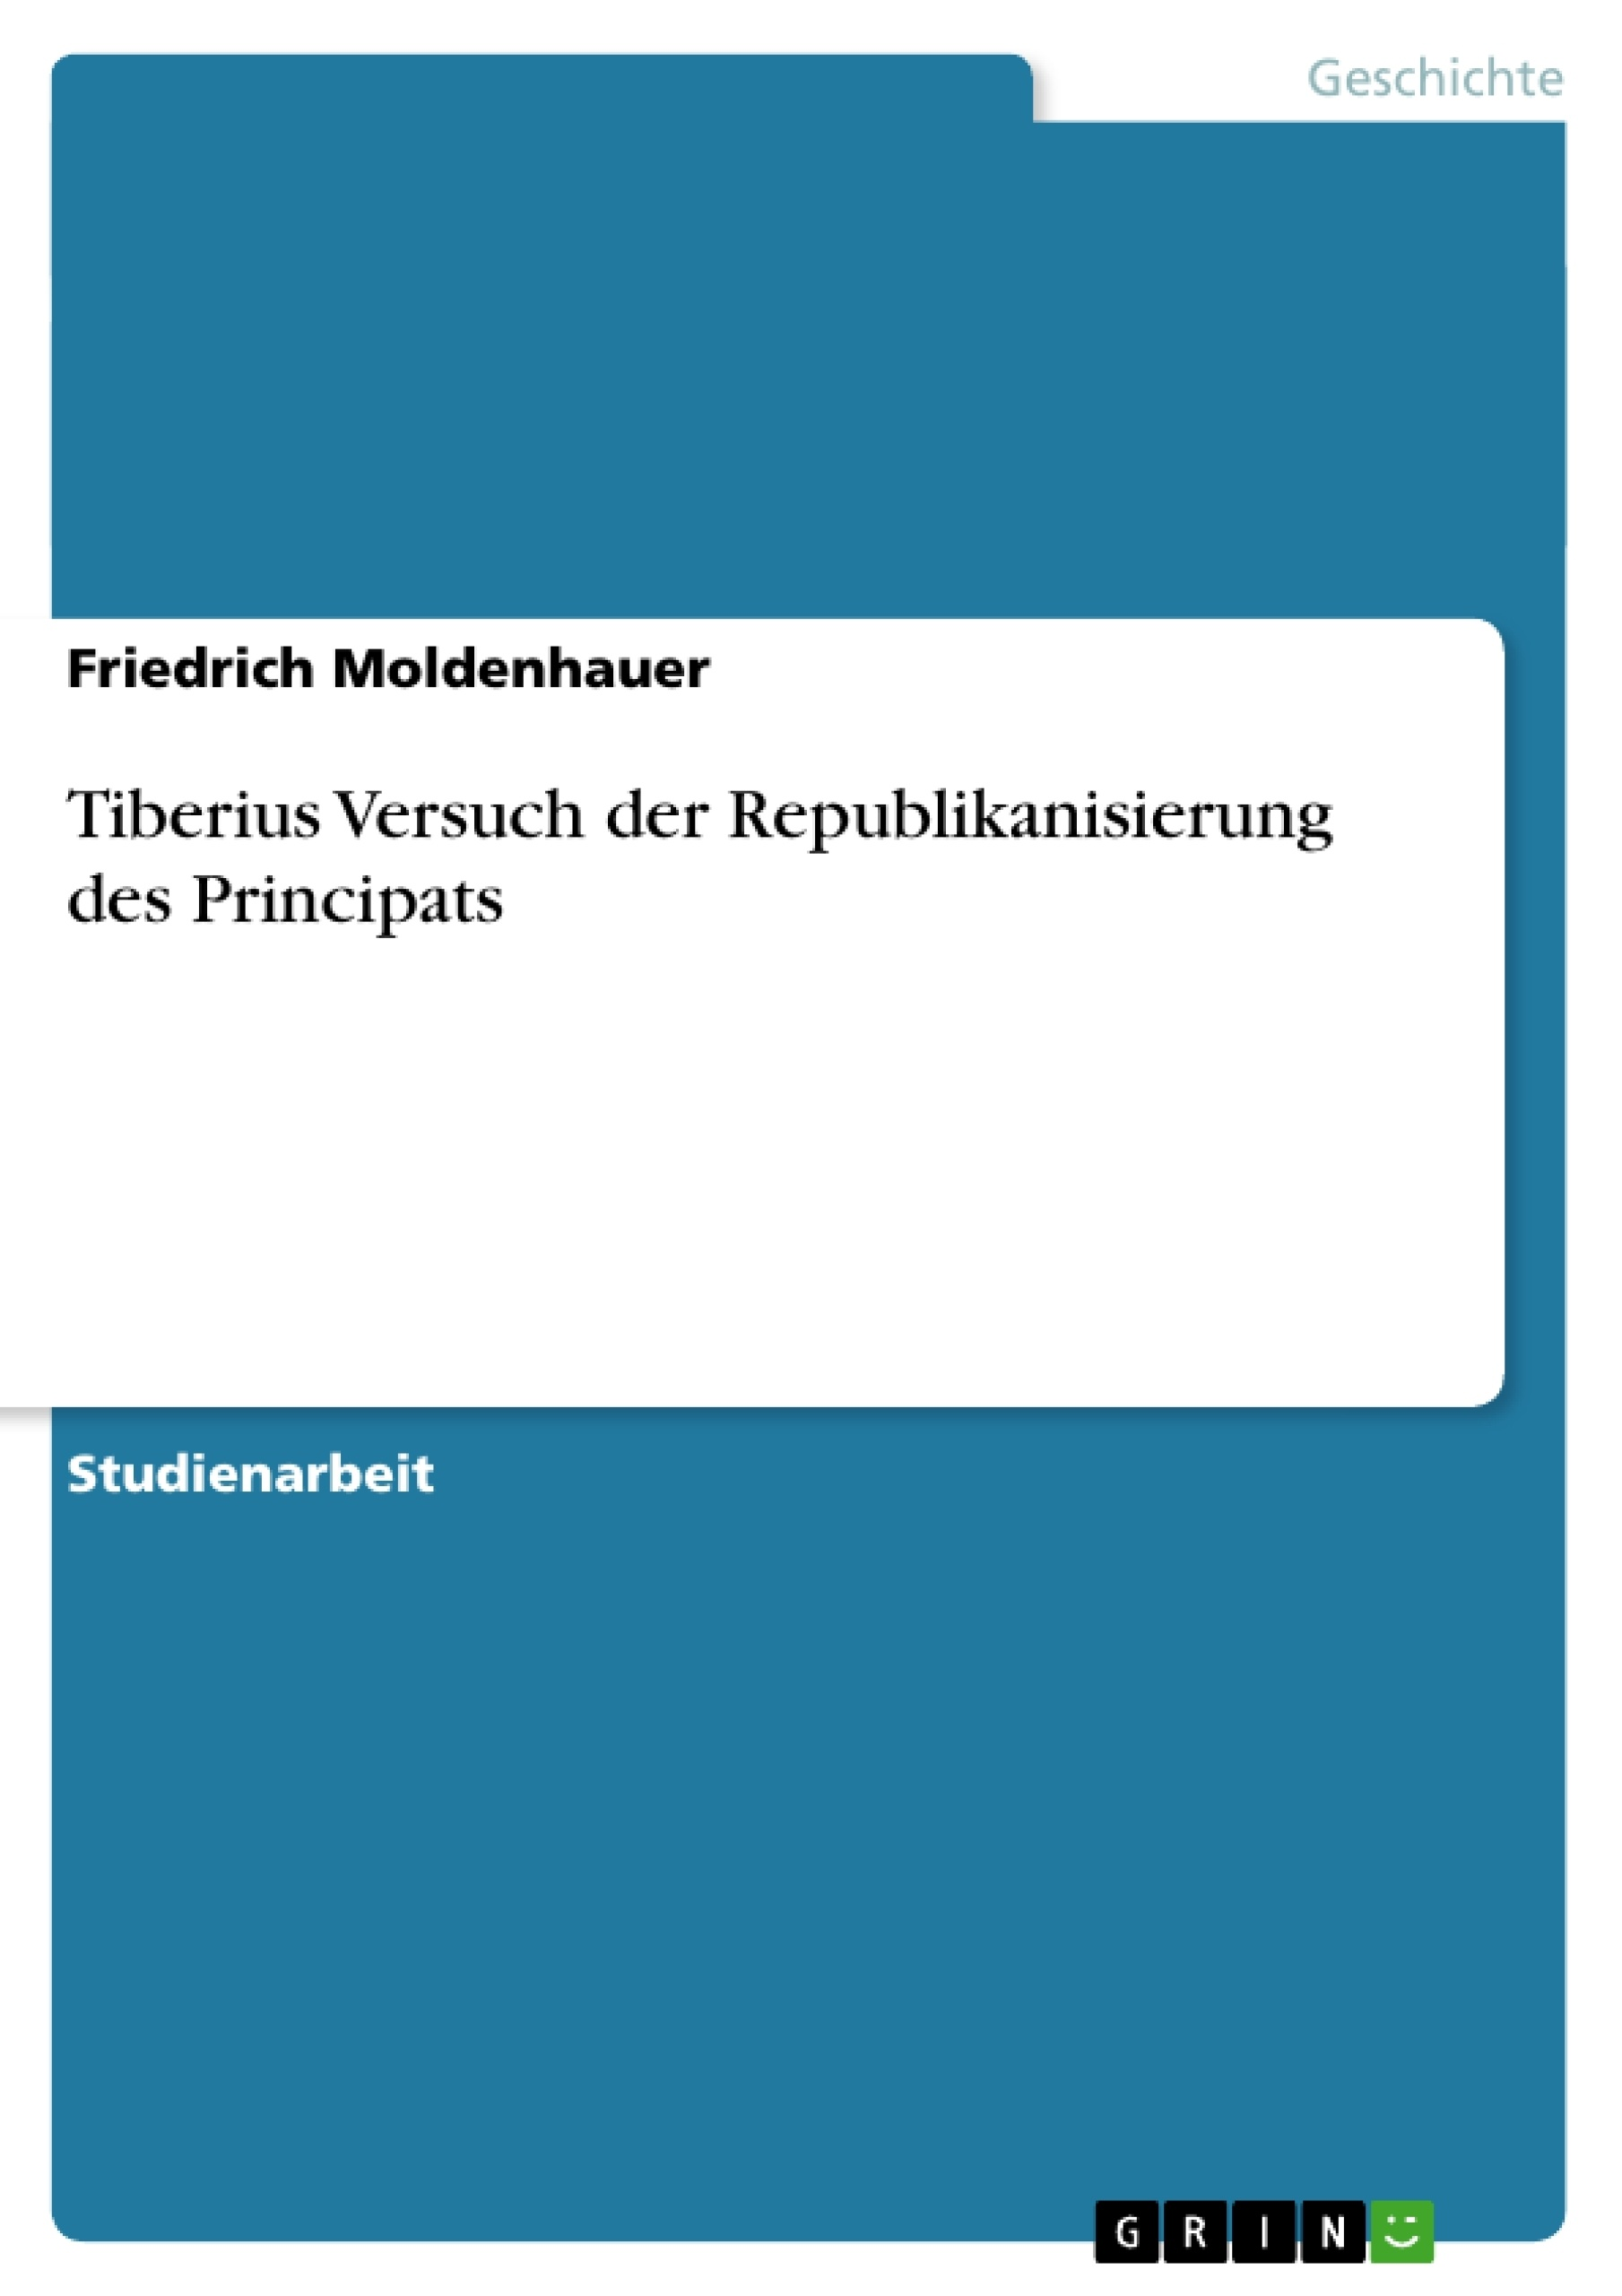 Titel: Tiberius Versuch der Republikanisierung des Principats